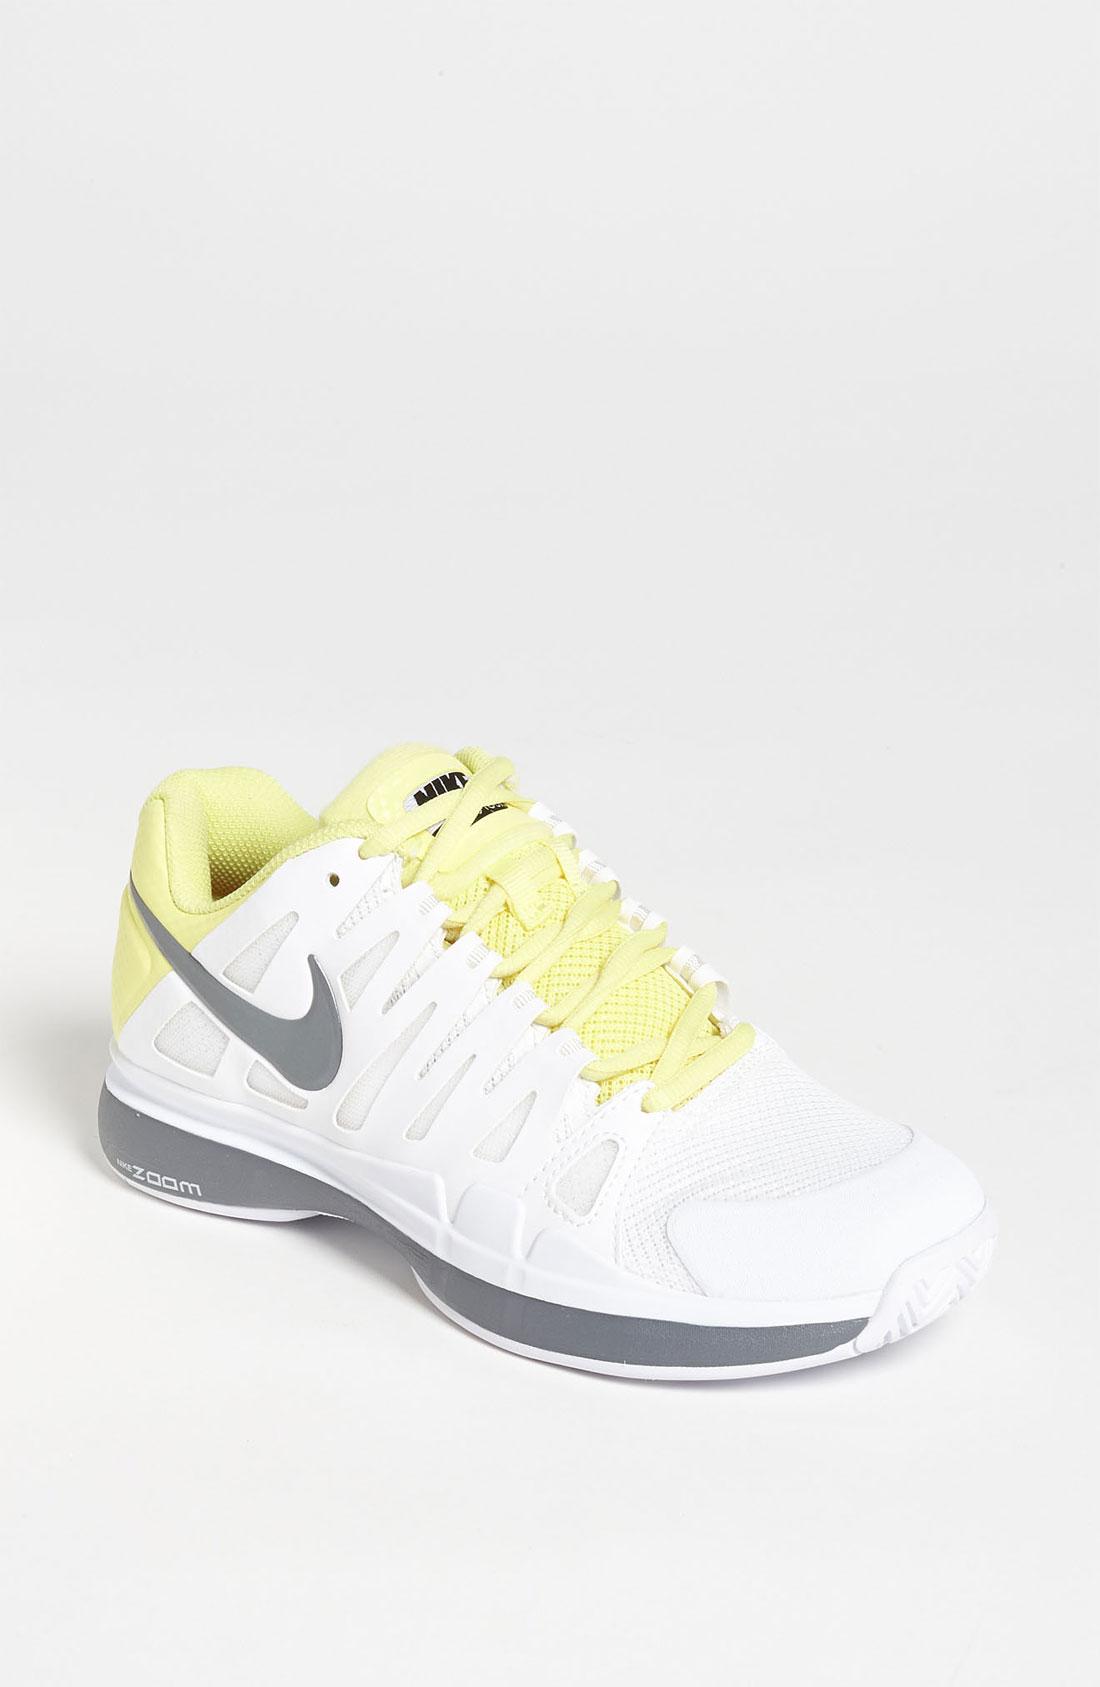 nike zoom vapor 9 tour tennis shoe in white grey